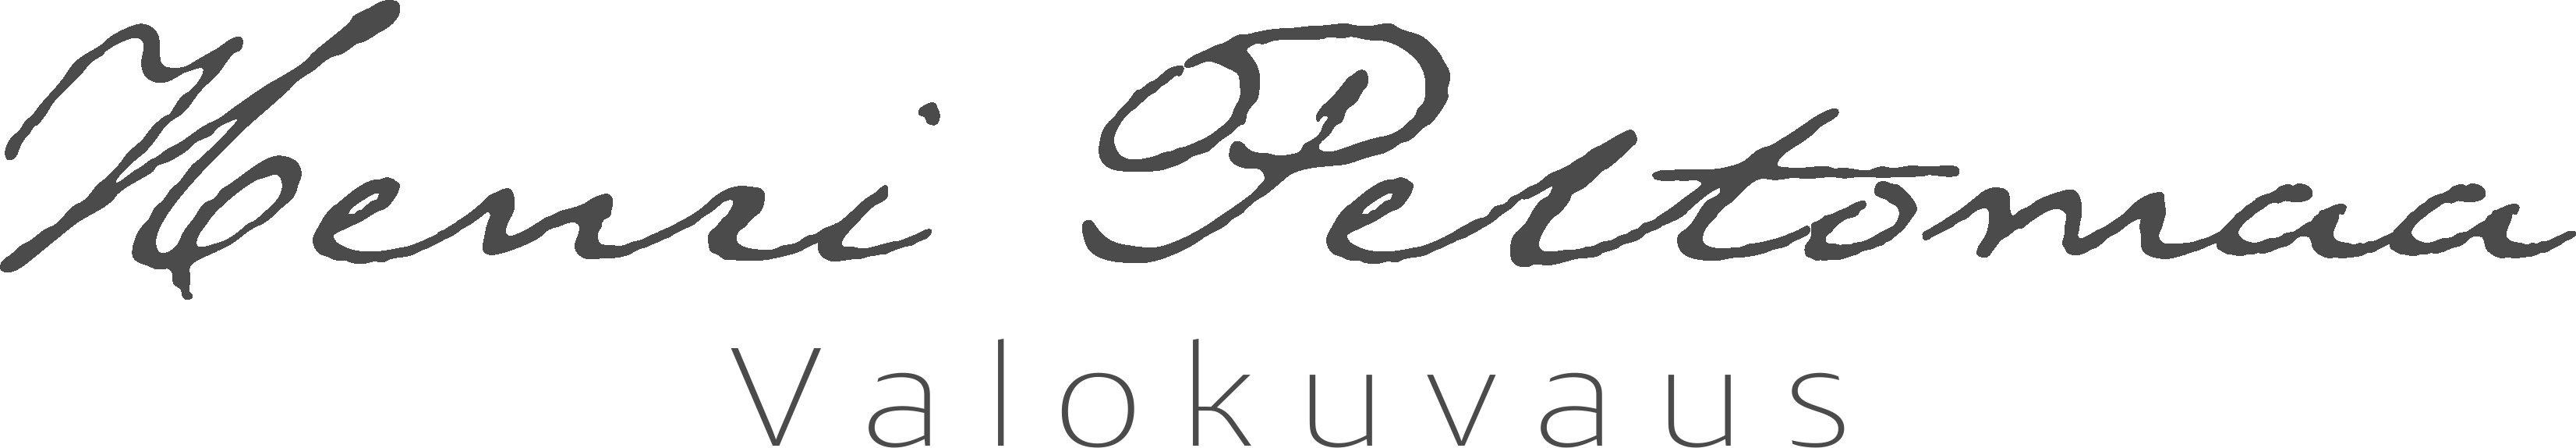 Logo for Henri Peltomaa valokuvaus • Pori, Finland